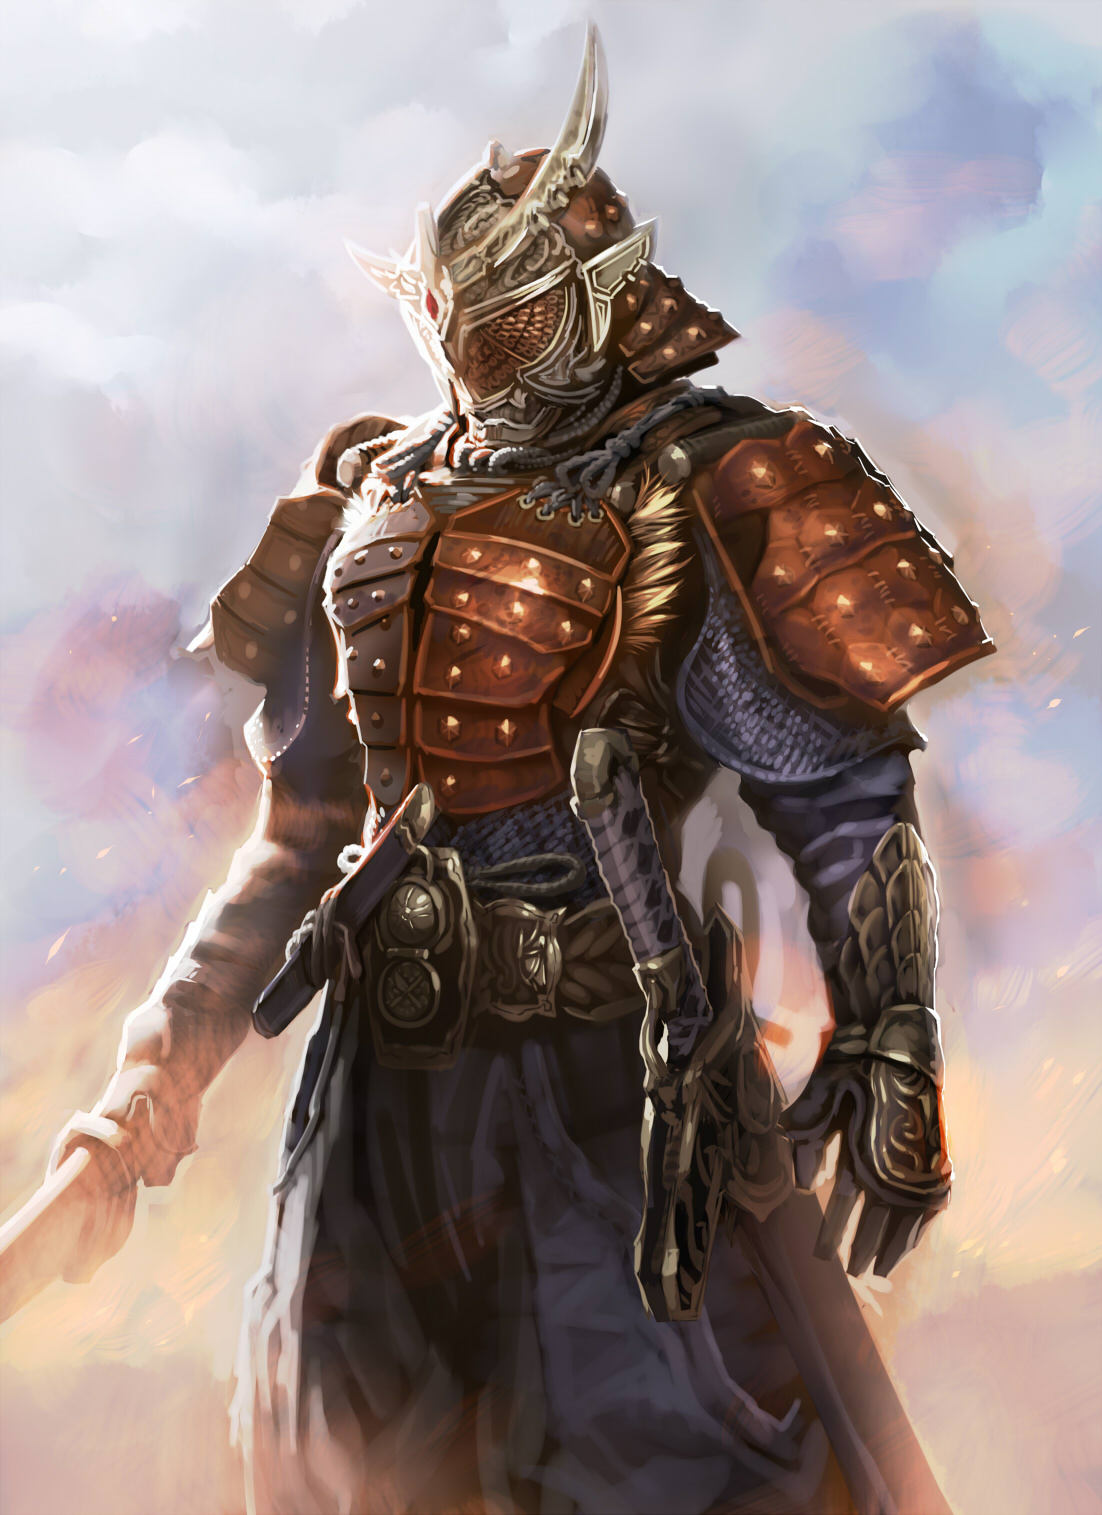 Drawn samurai kamen rider Samurai Gaim Your Rider Gaim